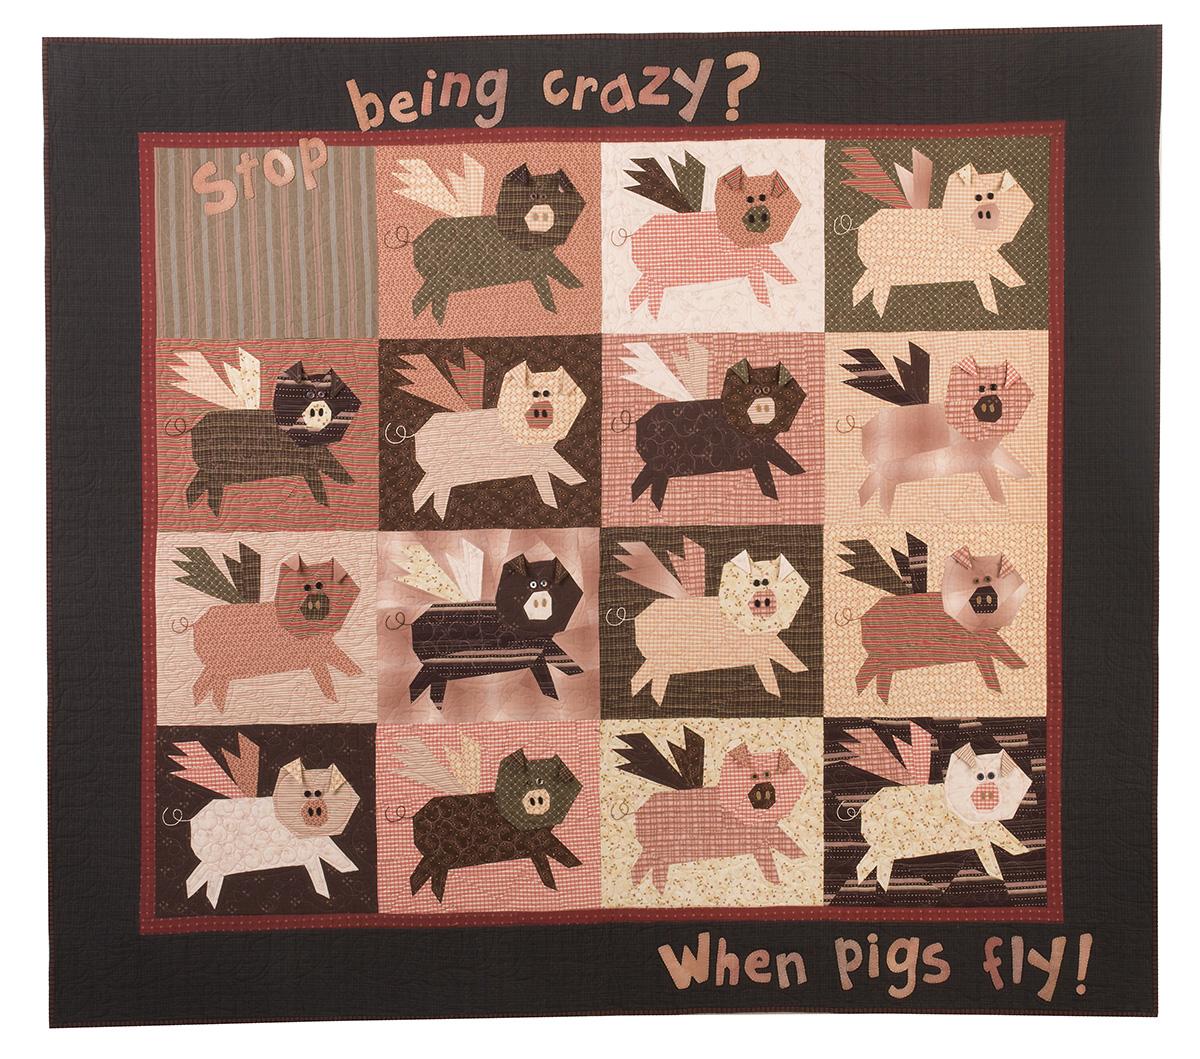 when-pigs-fly-3898.jpg